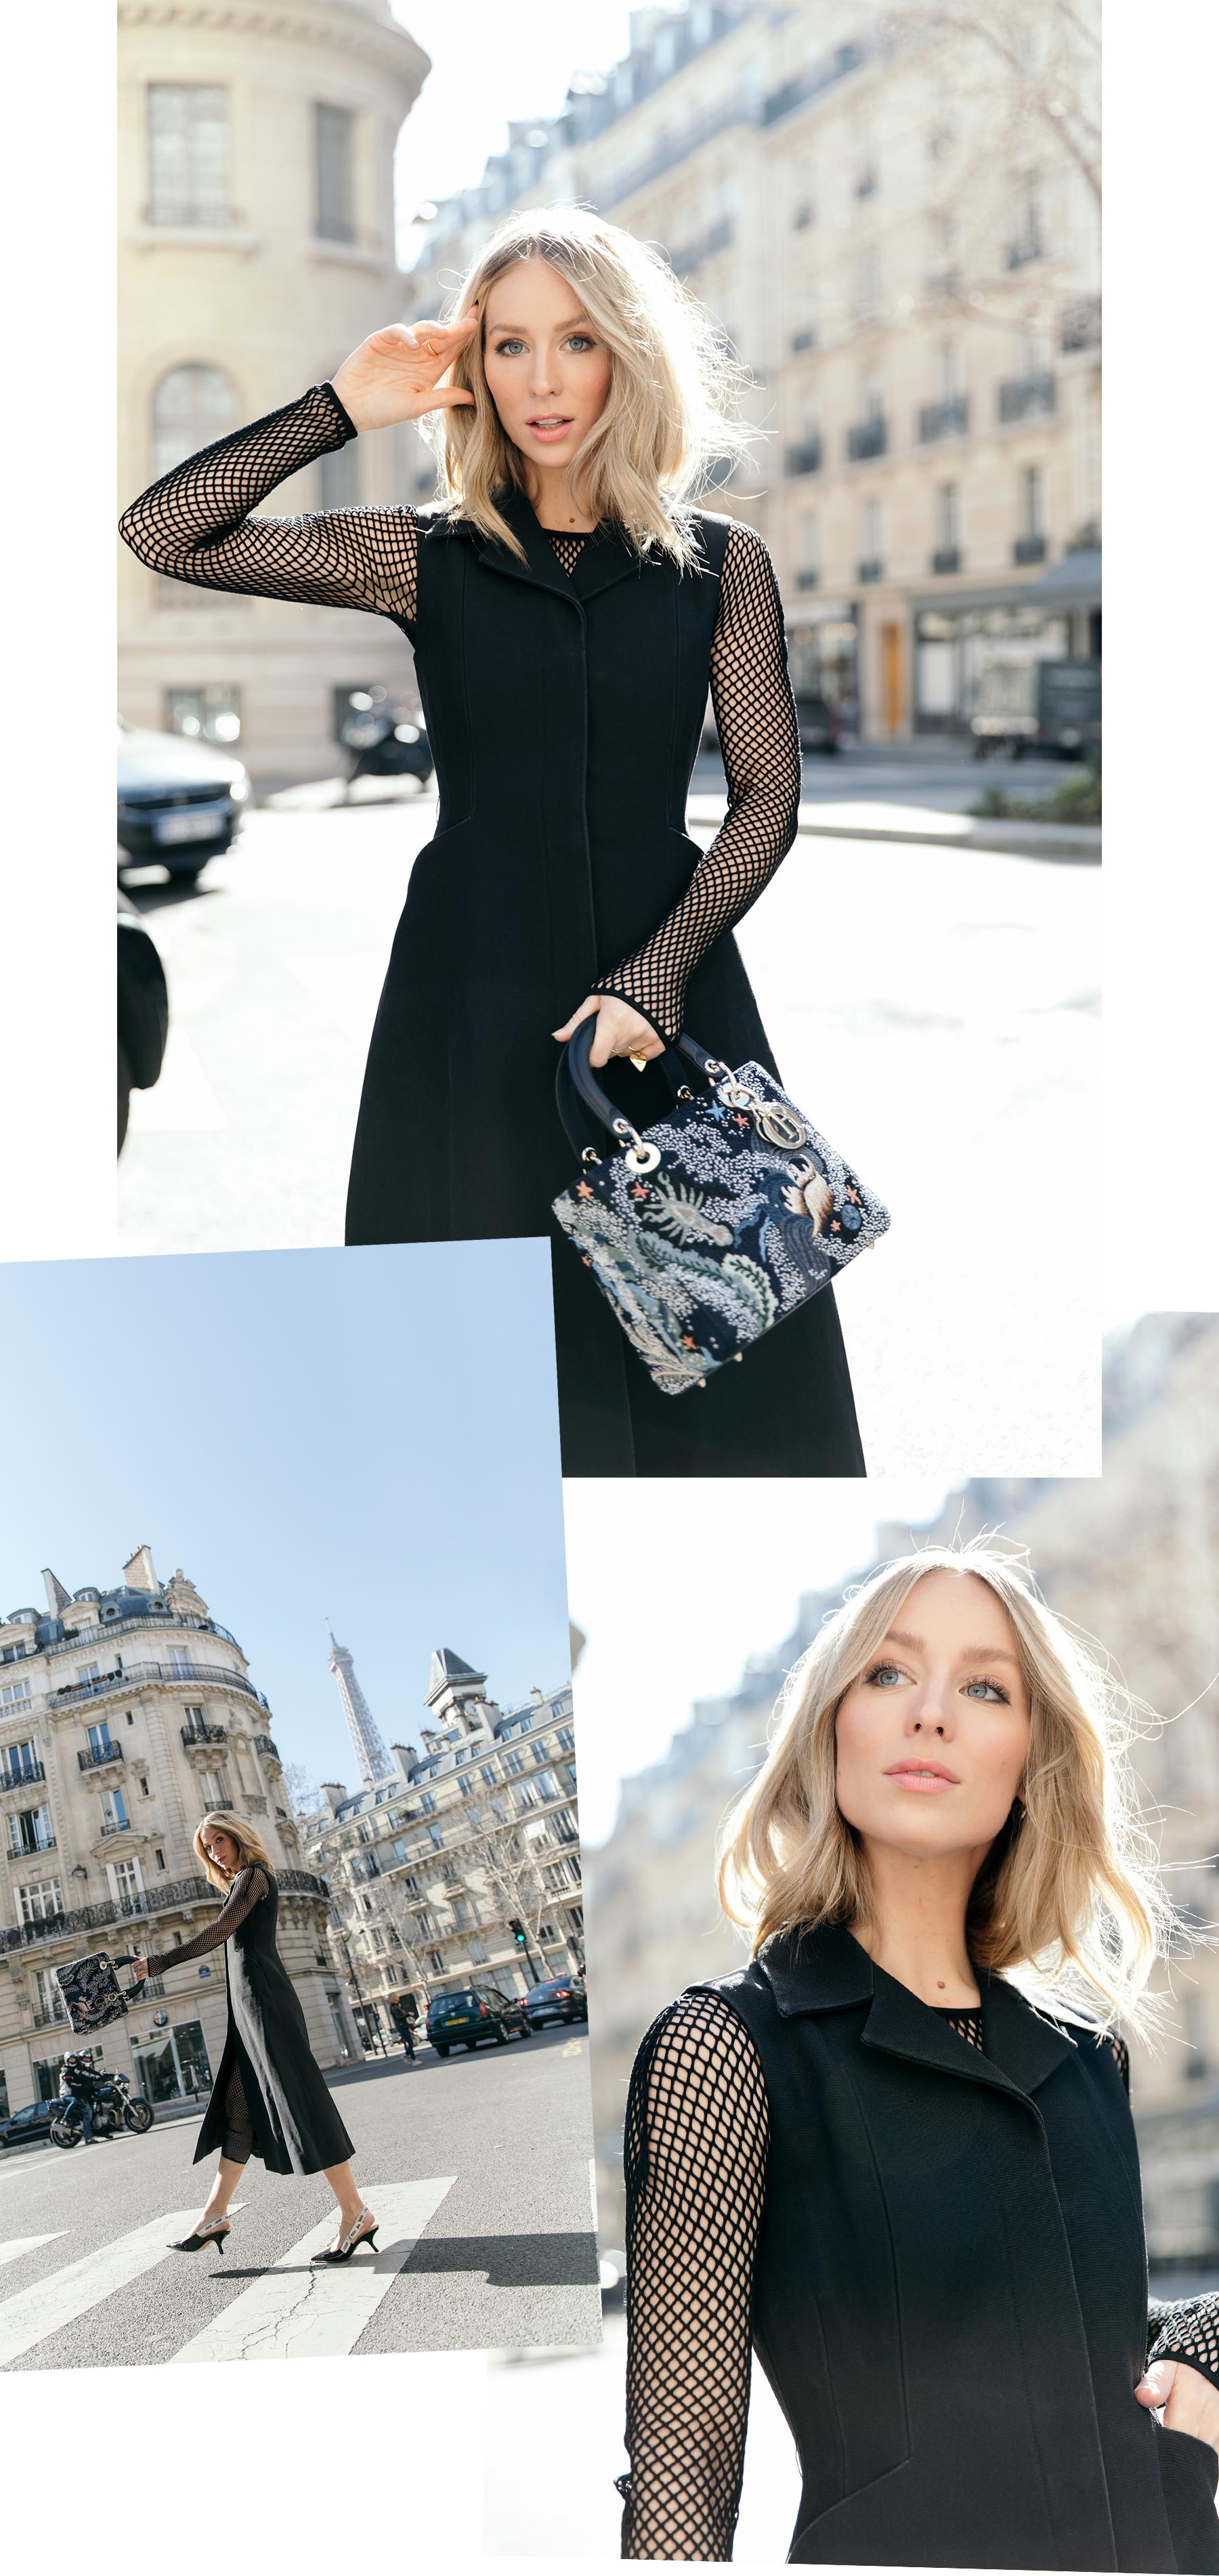 ParisFashionWeek_CarinOlsson_02.jpg